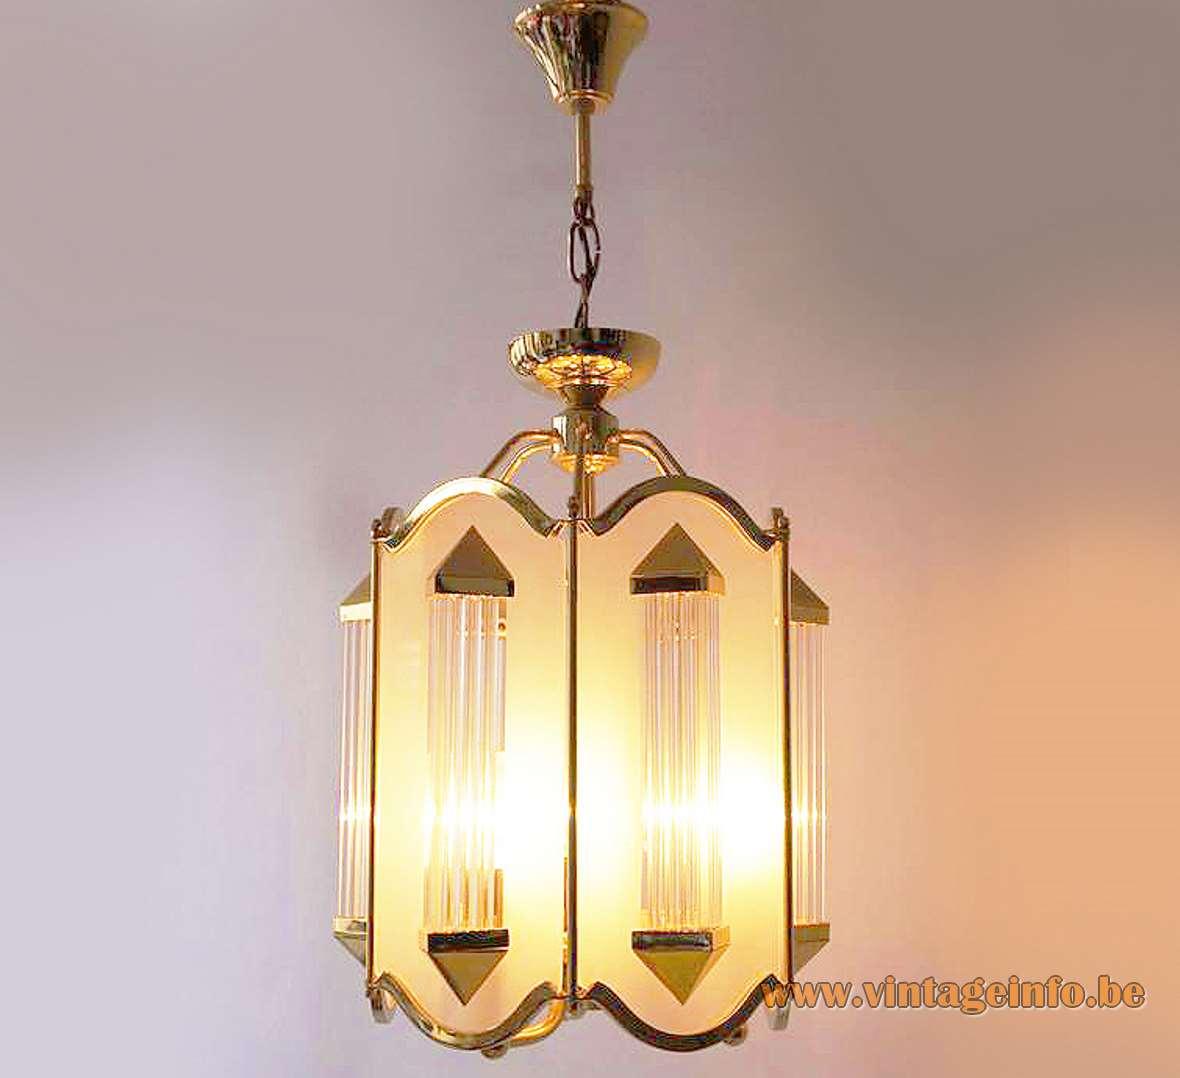 Crystal glass rods lantern pendant lamp gilded brass tubes & chain lampshade Honsel Leuchten Germany